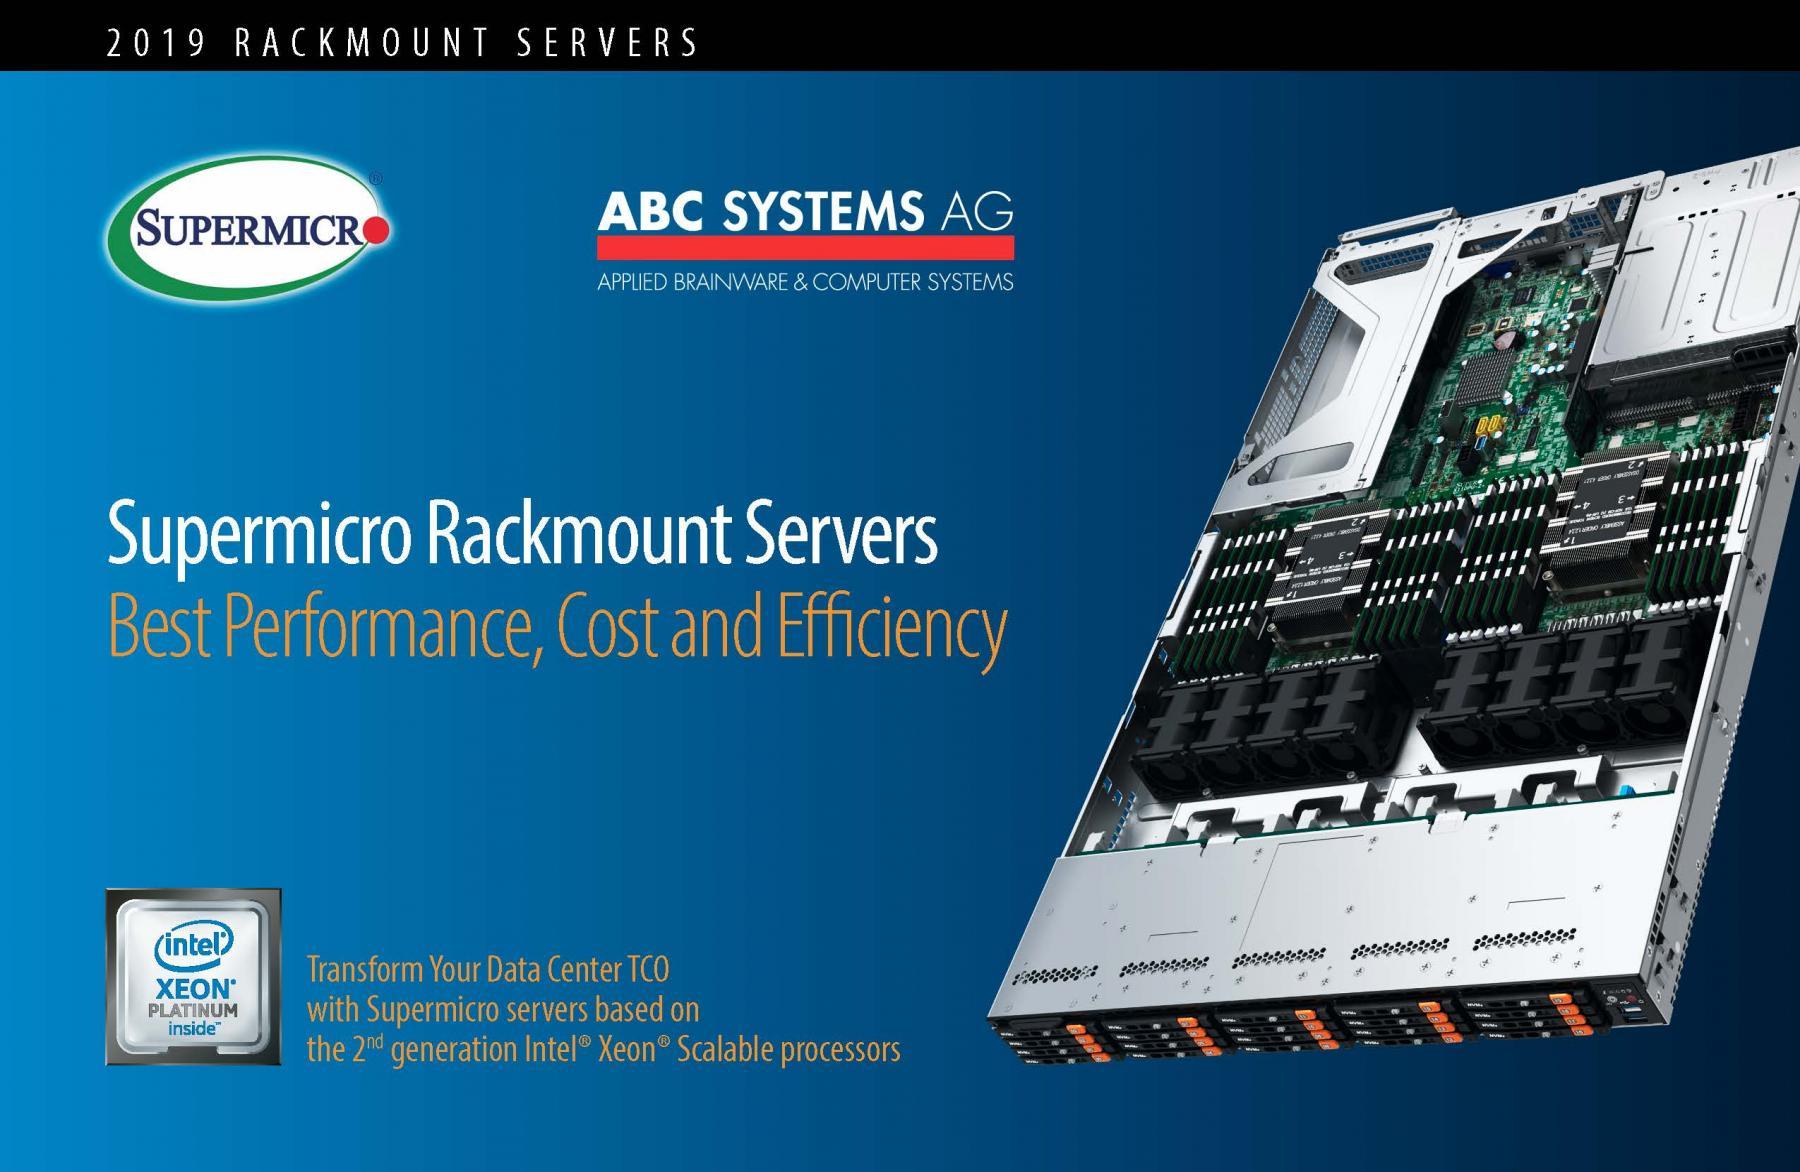 02 rackmount-family half 191119 rev1 1 ABC